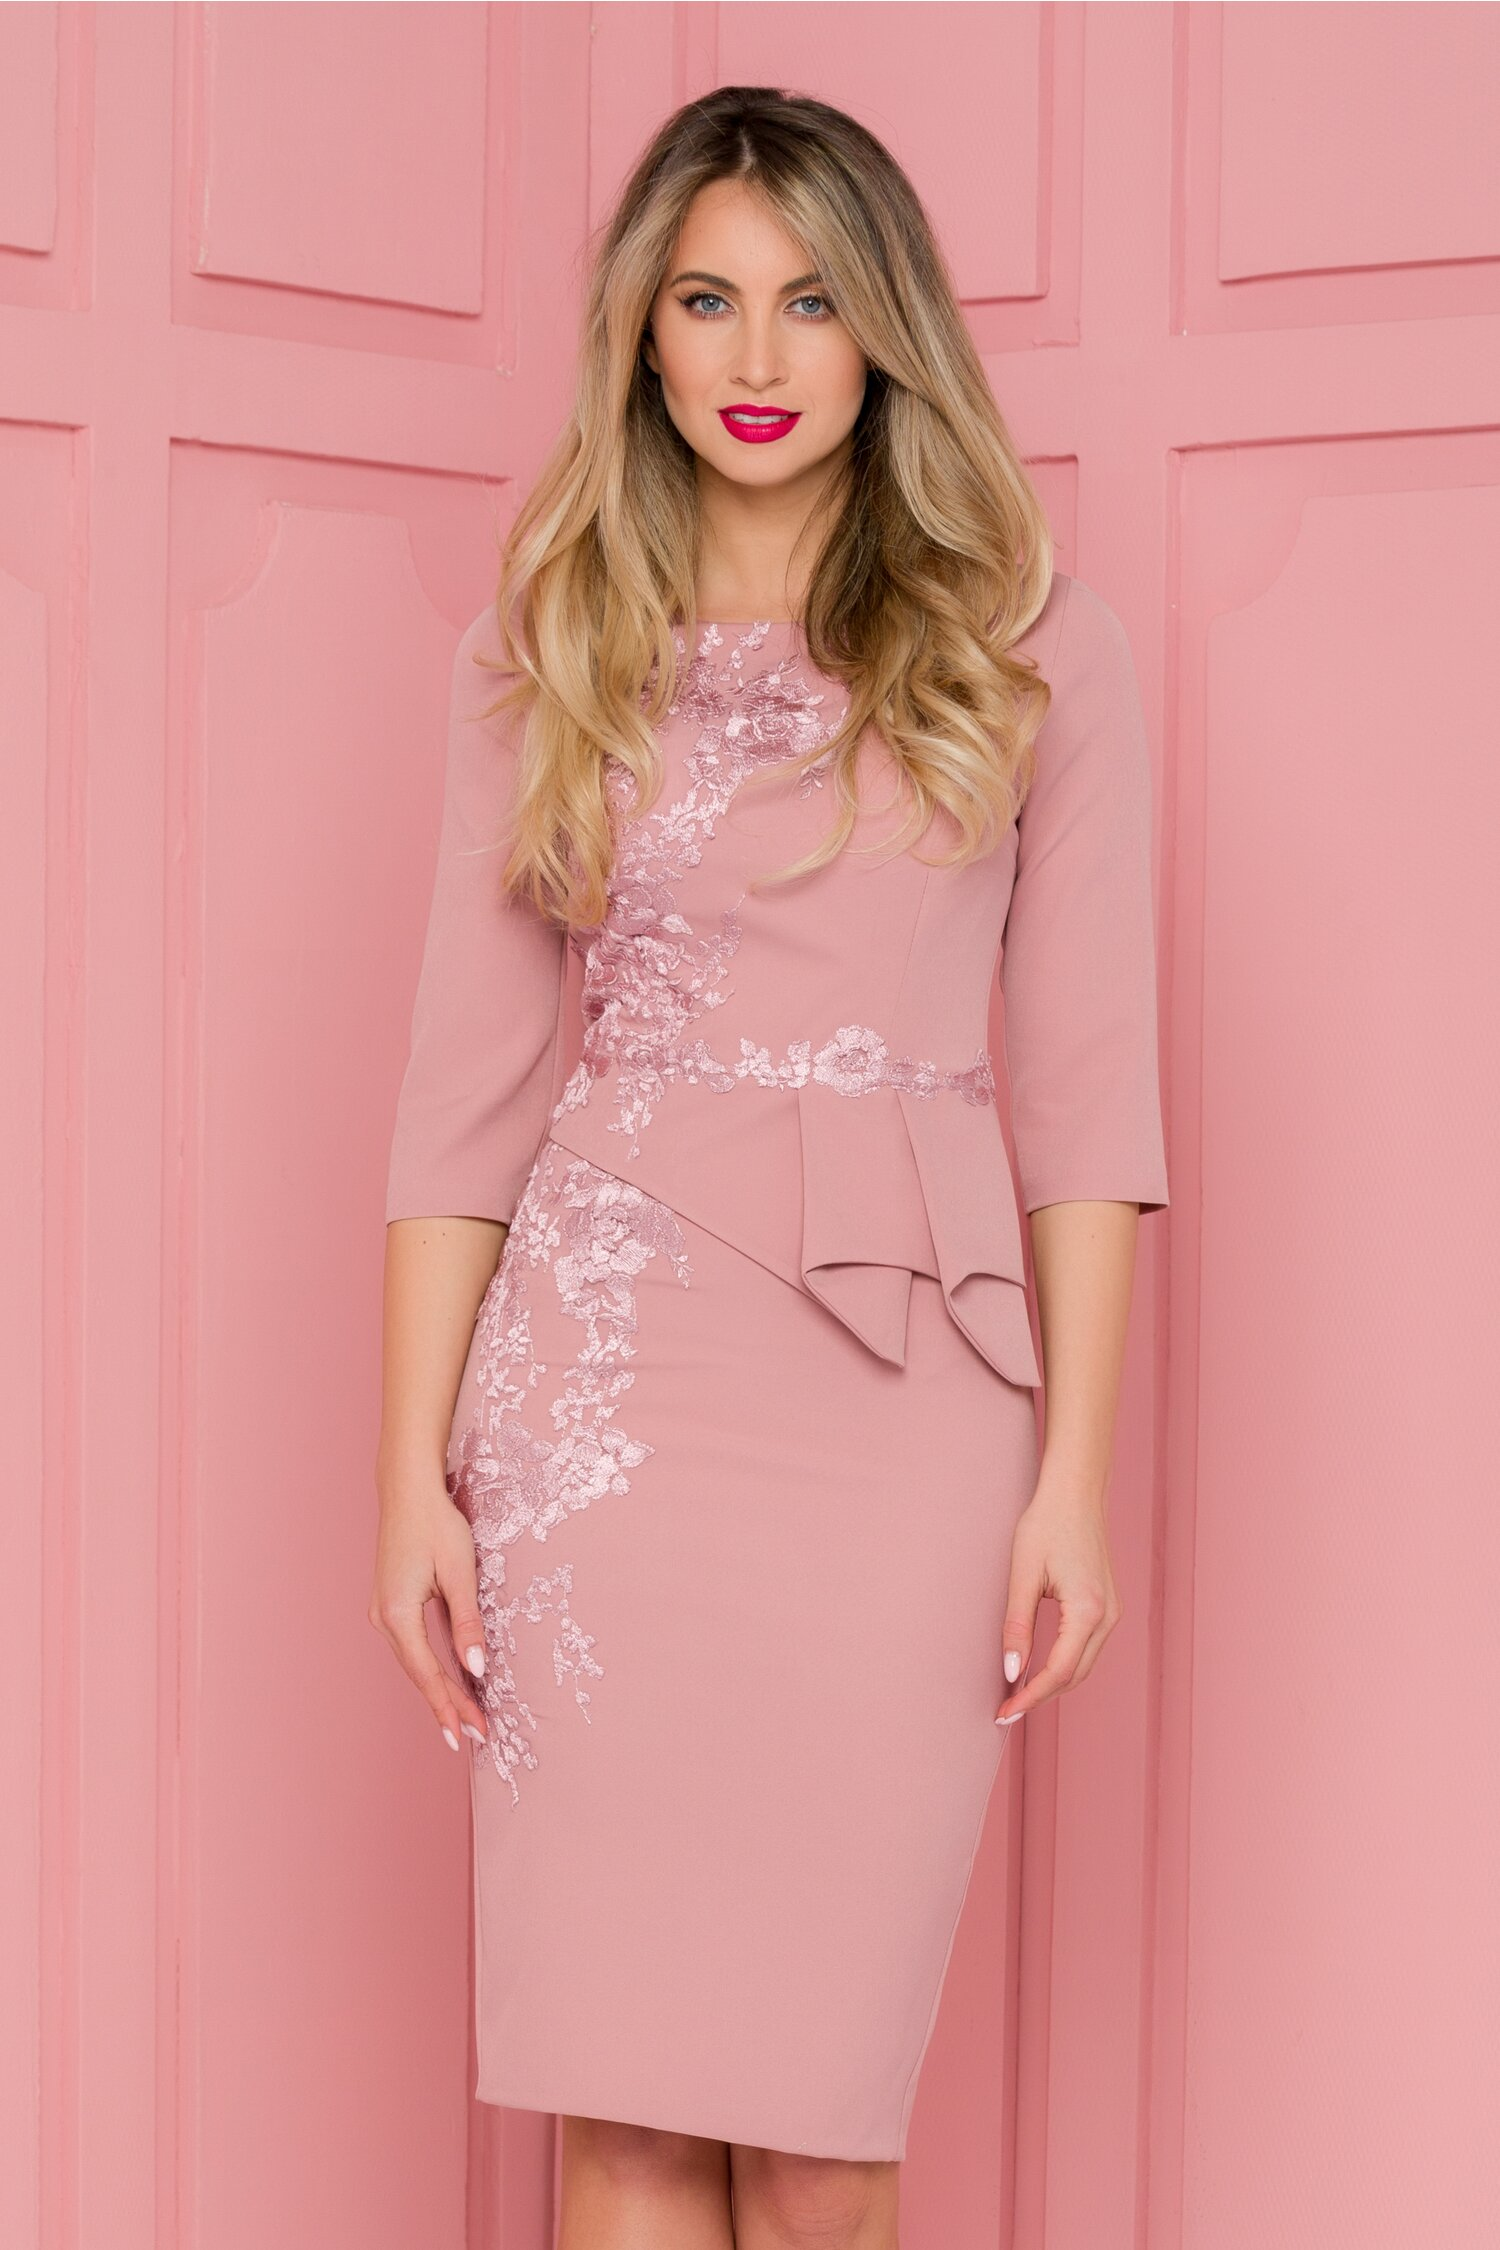 Rochie MBG roz prafuit cu broderie florala